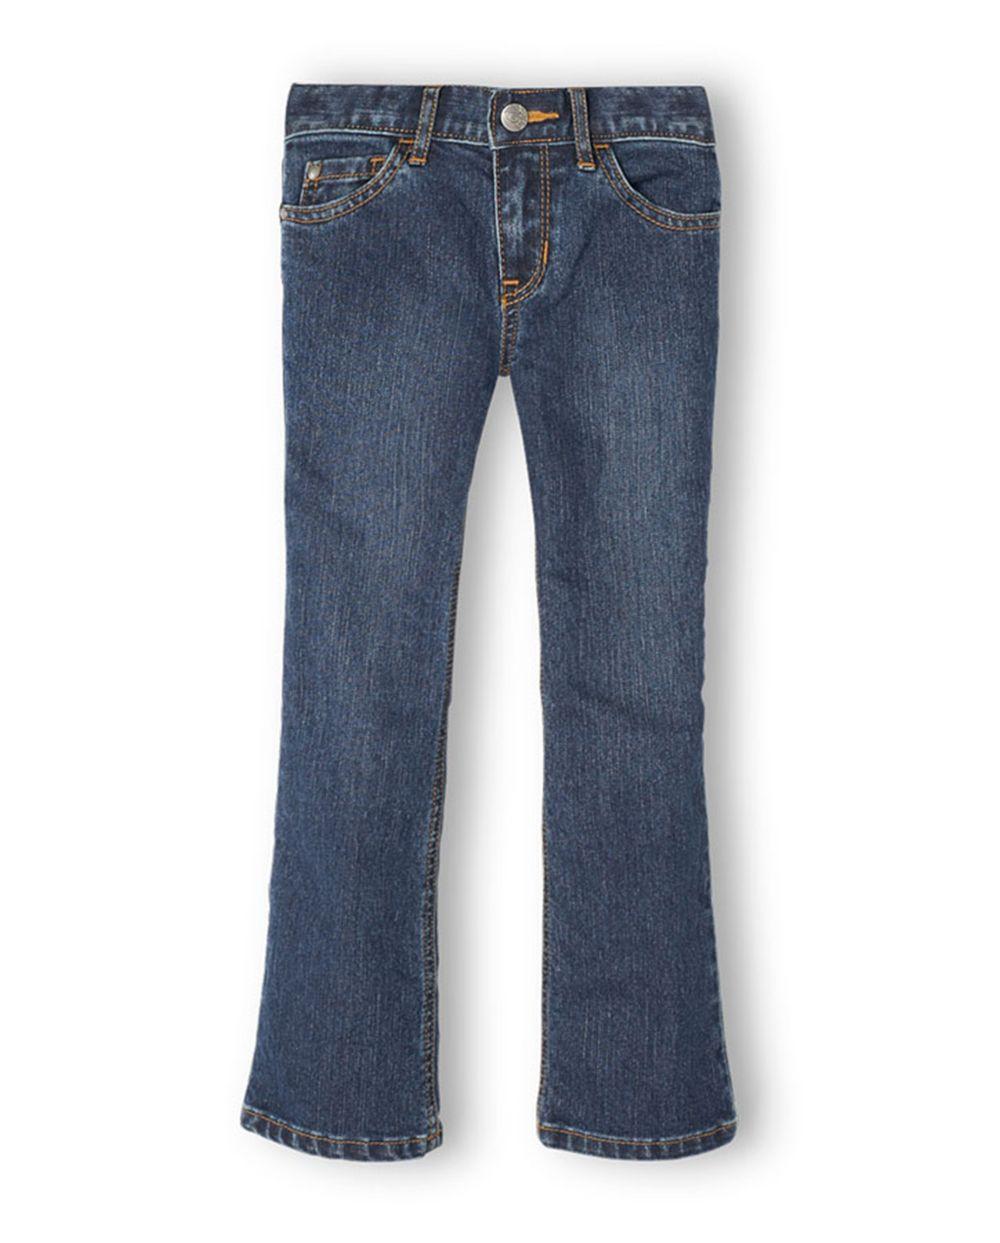 Cheap Girls Basic Bootcut Jeans